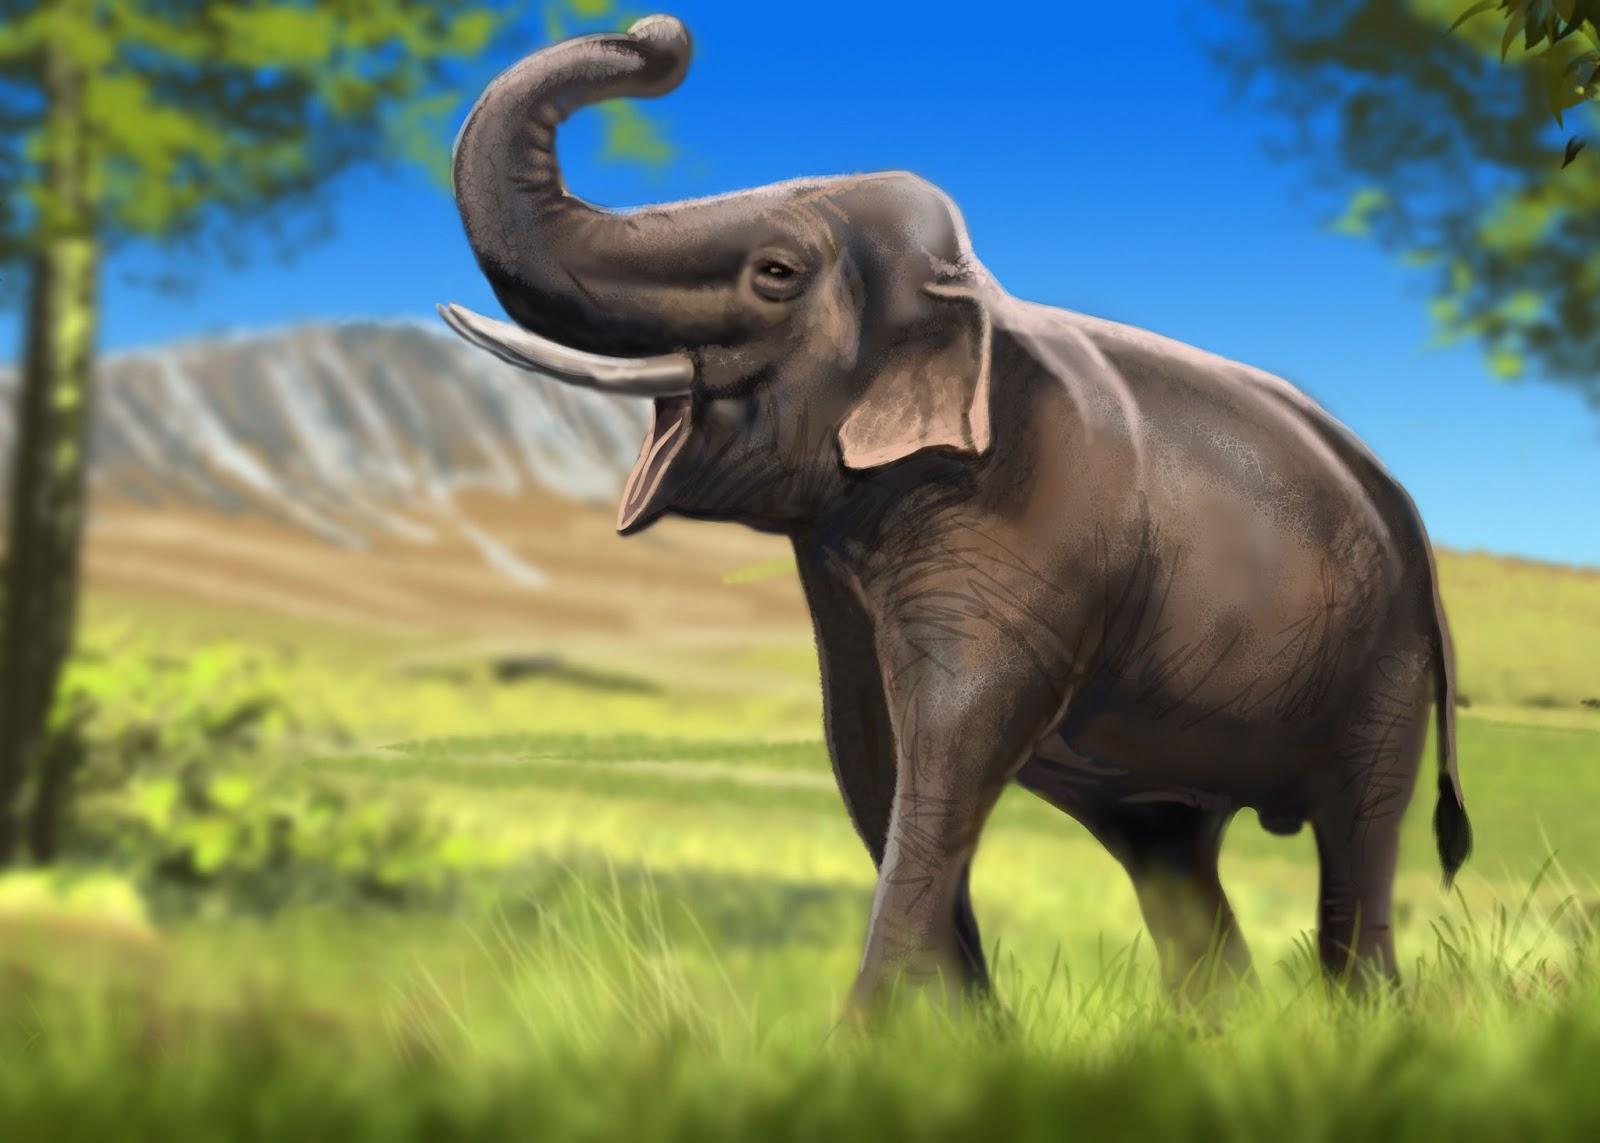 Zoo Park Run Your Own Animal Sanctuary The Indian Elephant